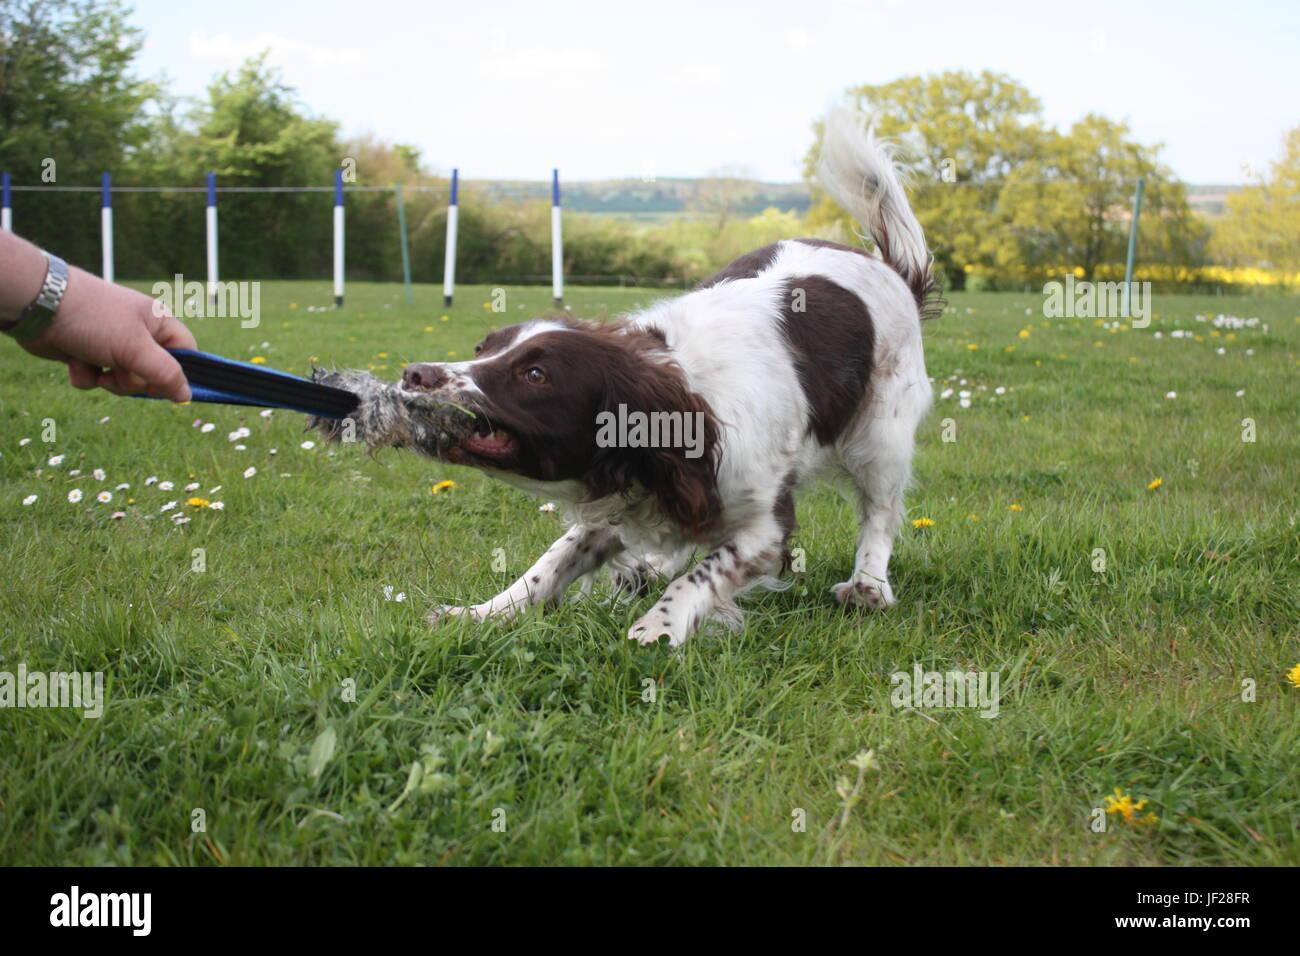 liver and white working type english springer spaniel gundog tugging on a toy - Stock Image